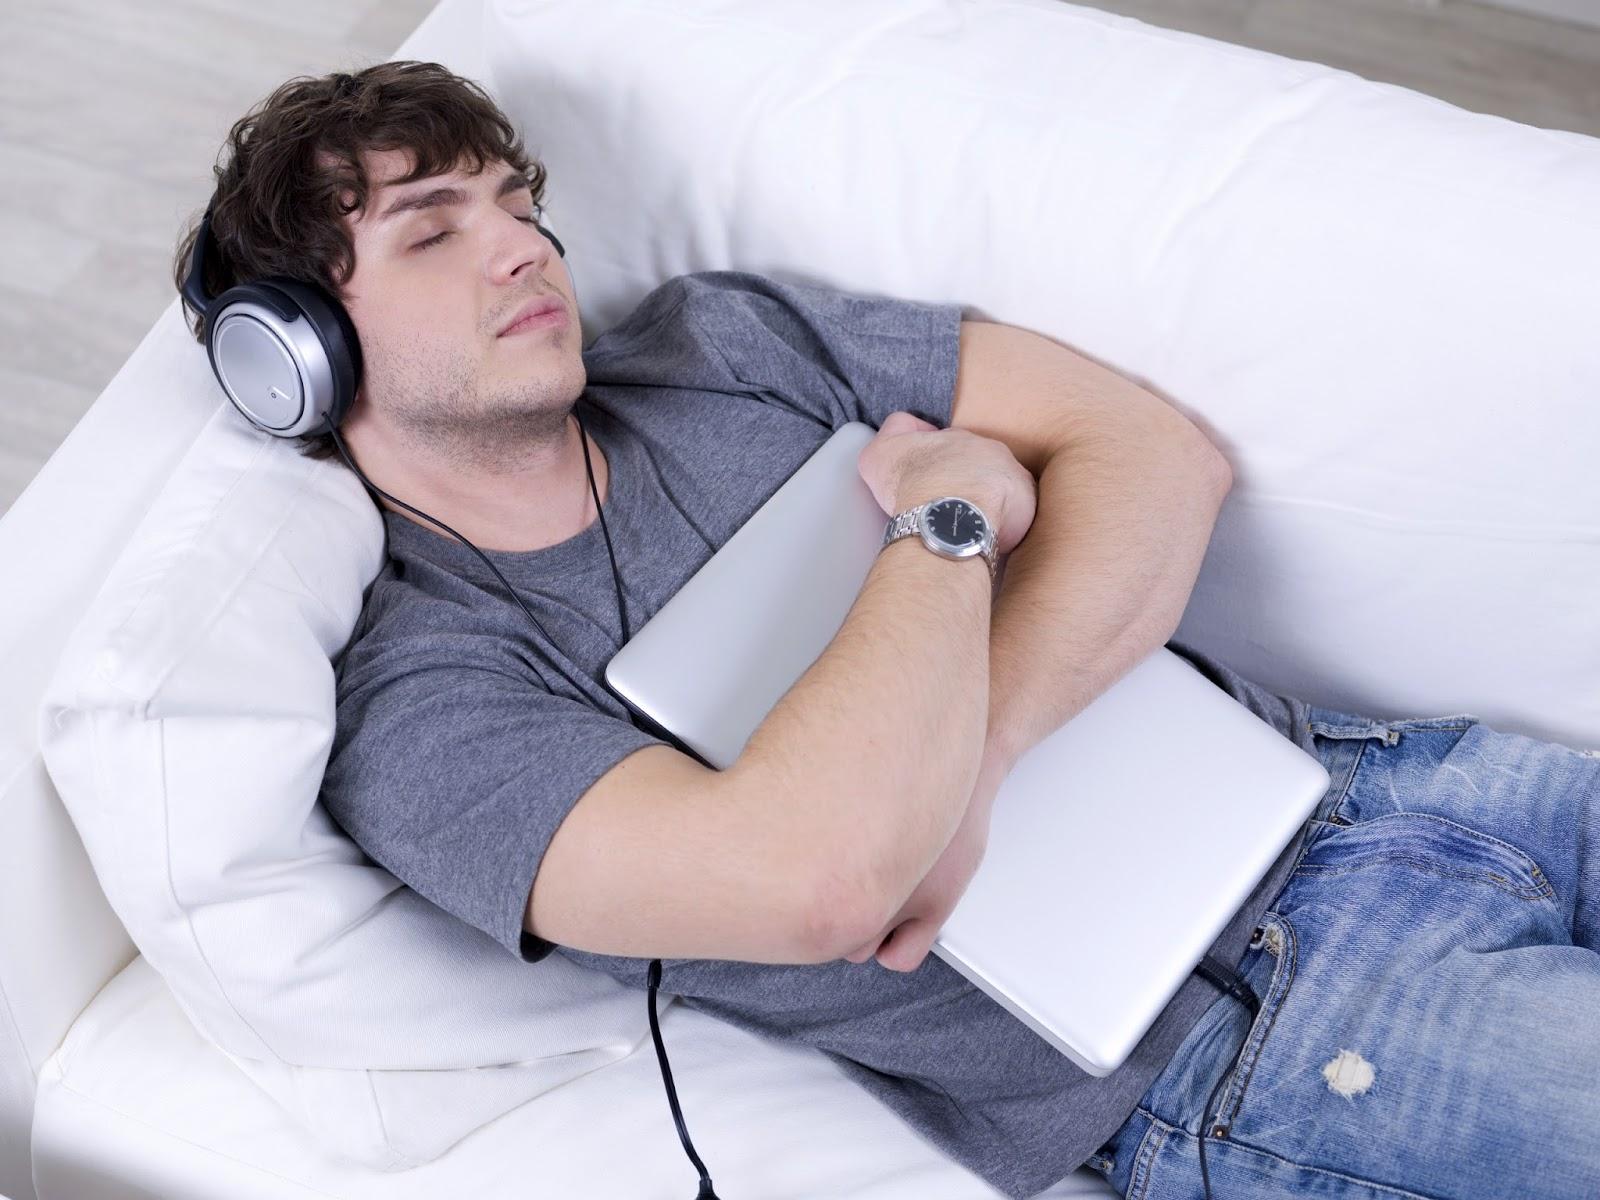 Benarkah Kurang Tidur sanggup Menyebabkan Kematian Benarkah Kurang Tidur sanggup Menyebabkan Kematian? Ini Penjelasannya